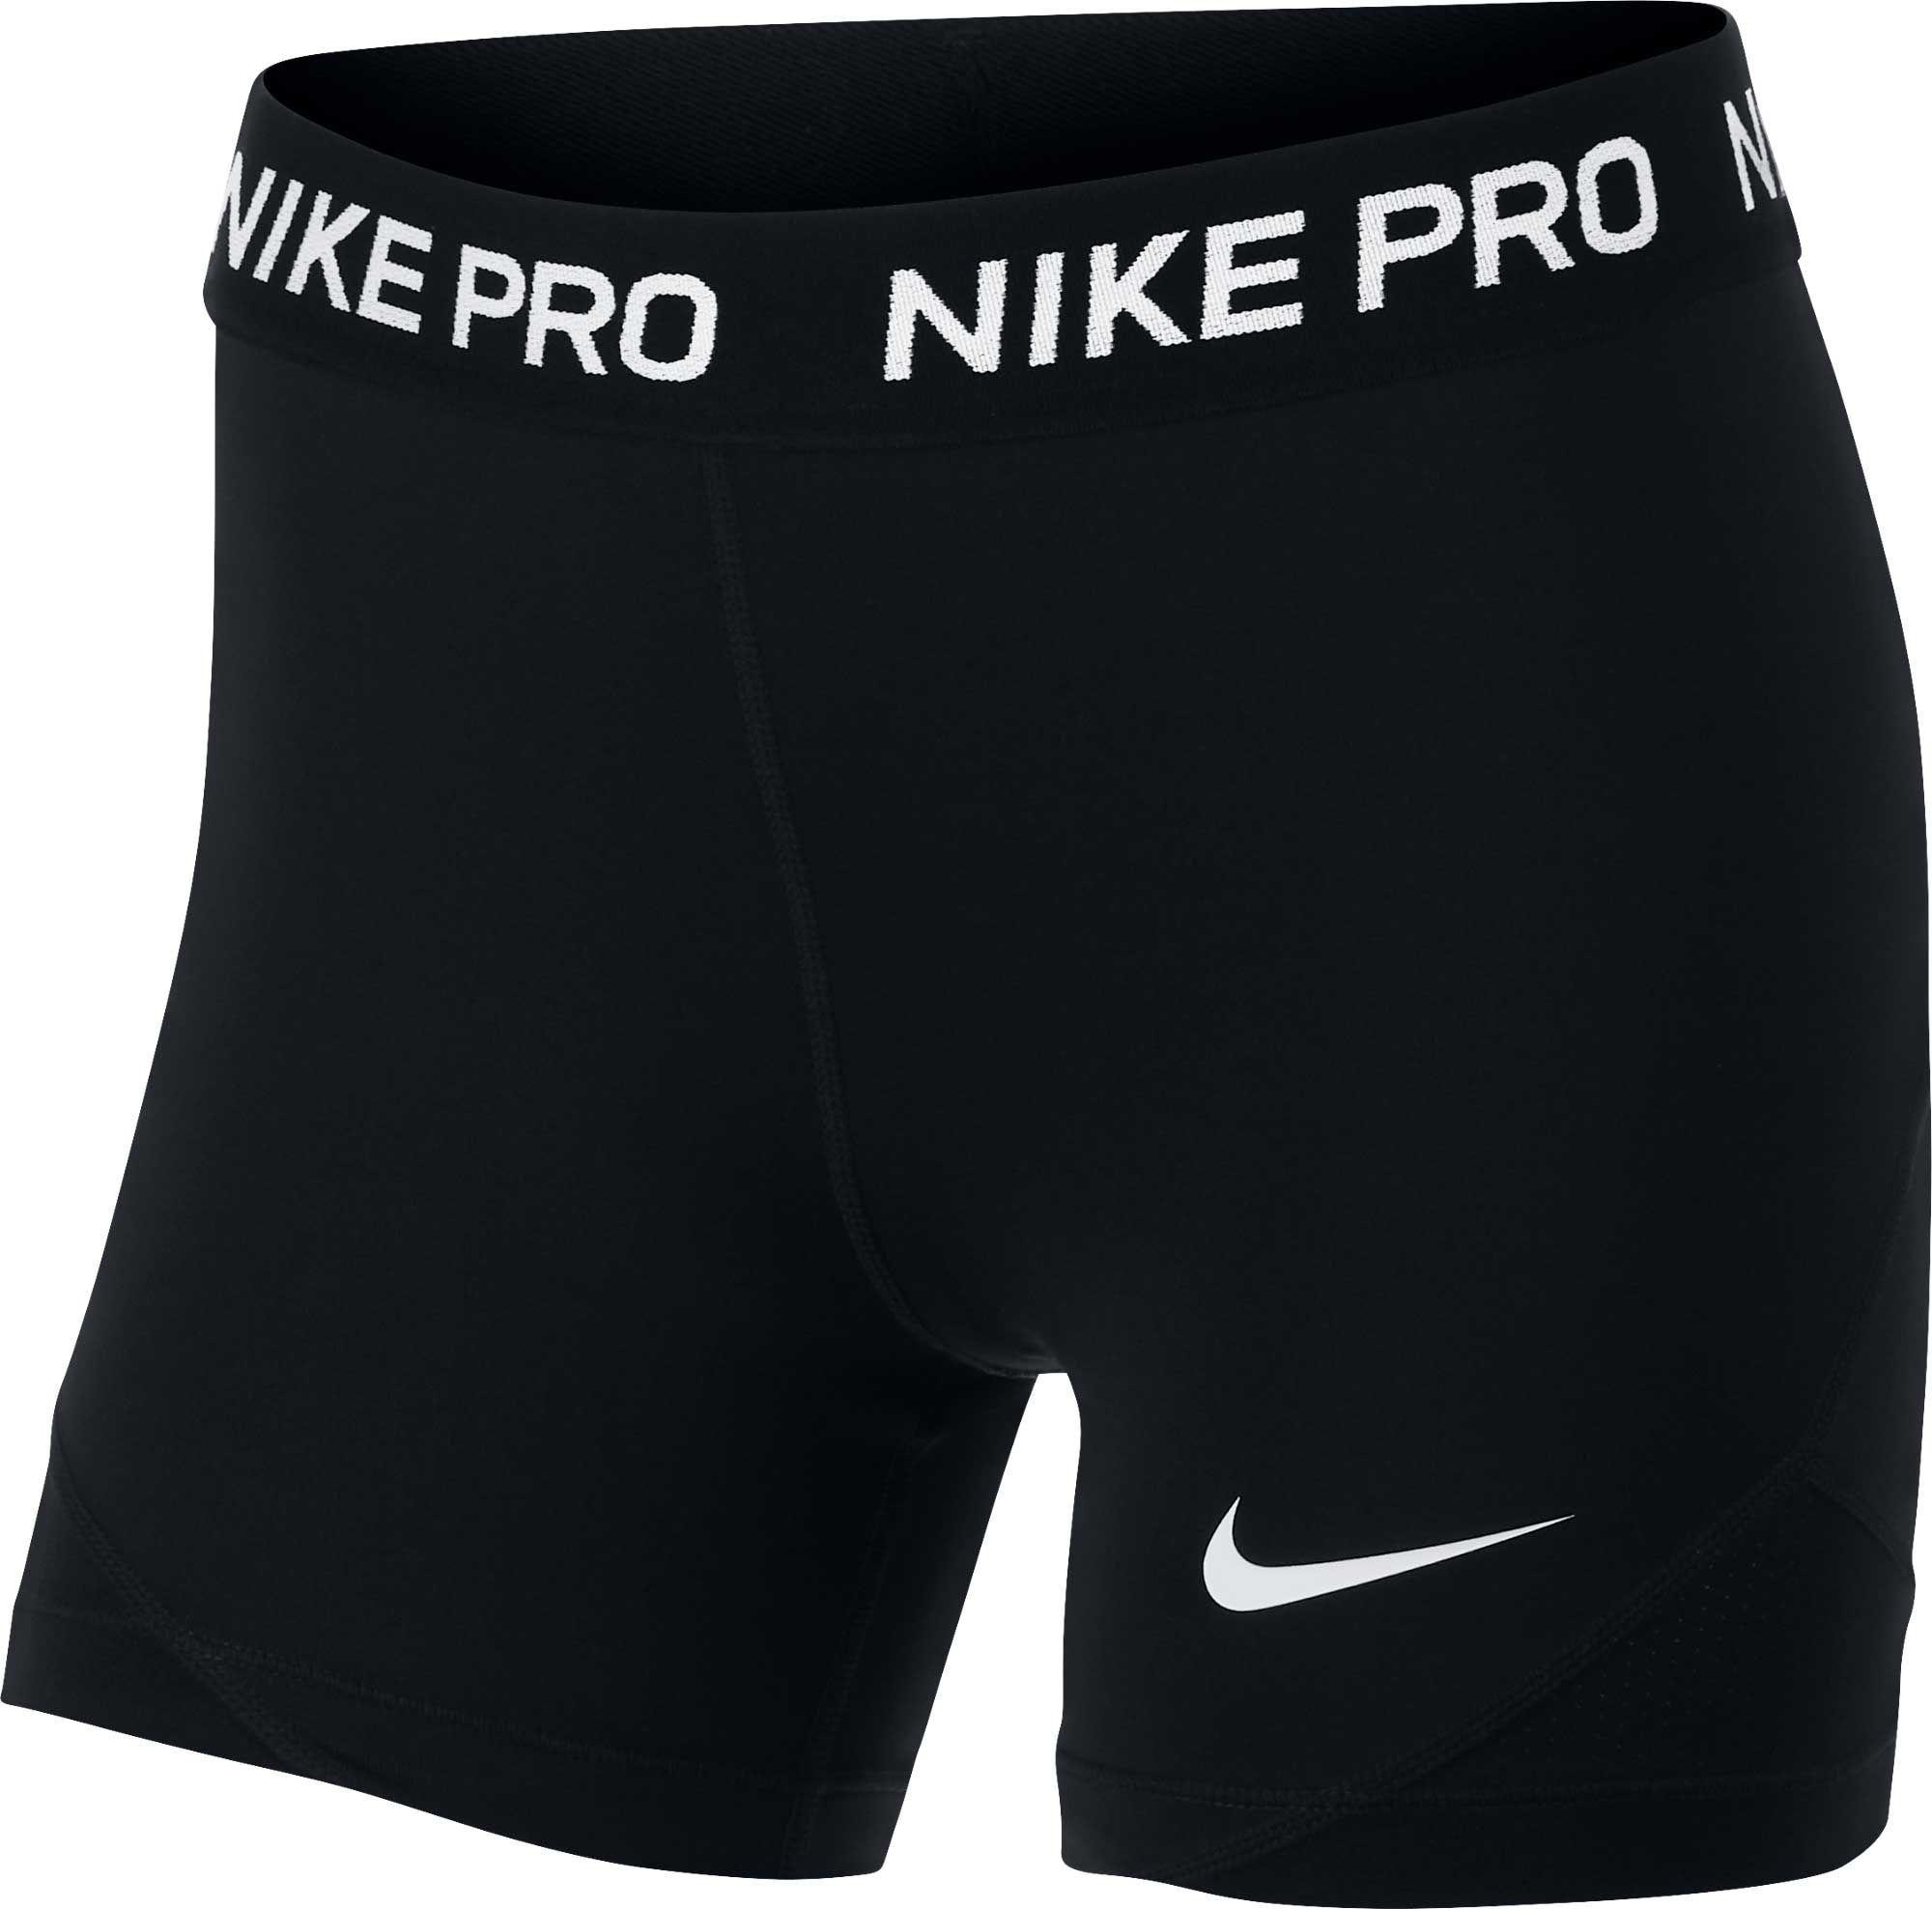 Nike Pro Girls' 4'' Shorts, XS, Black in 2020 Nike pros